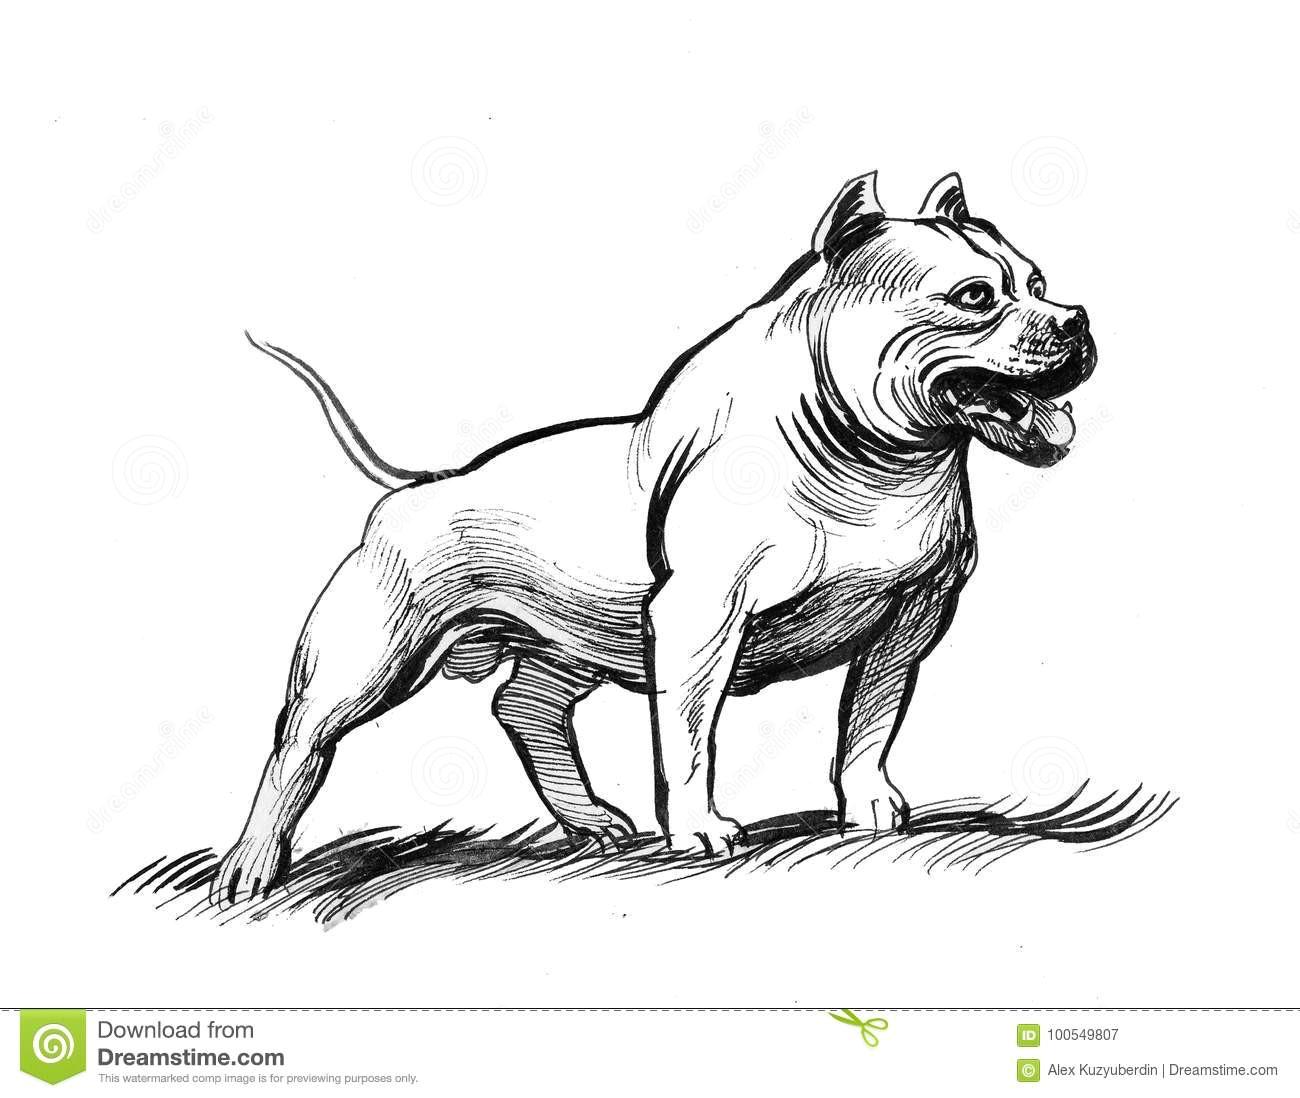 Drawing Of A Pitbull Dog Pit Bull Dog Stock Illustration Illustration Of Strong 100549807